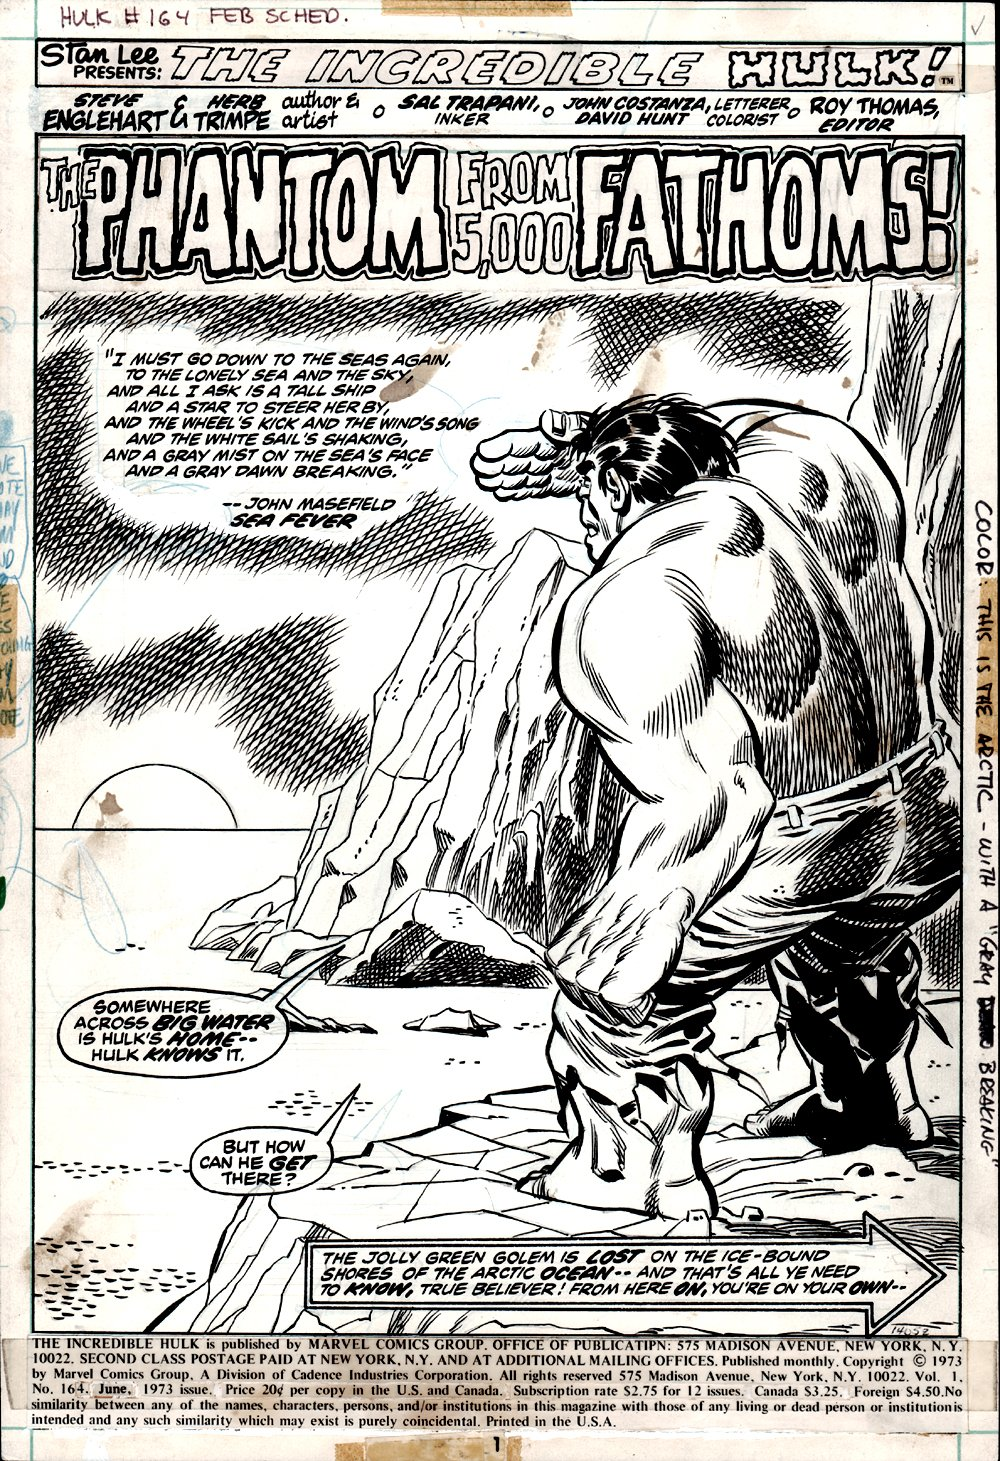 Incredible Hulk #164 p 1 SPLASH (1973)